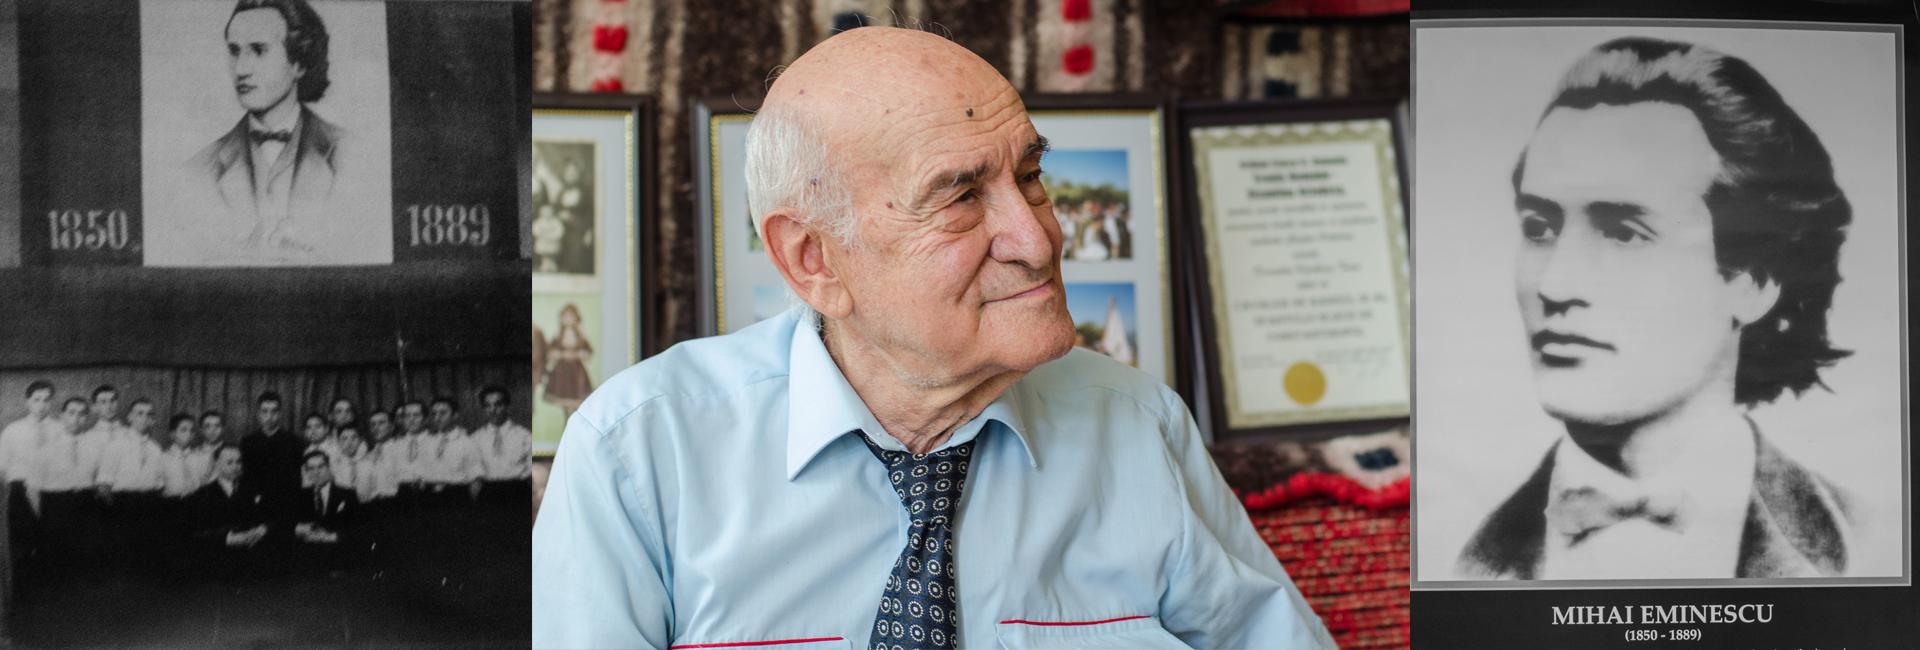 aromânul Toma Kiurkciev Sofia Bulgaria despre originea lui Eminescu slider